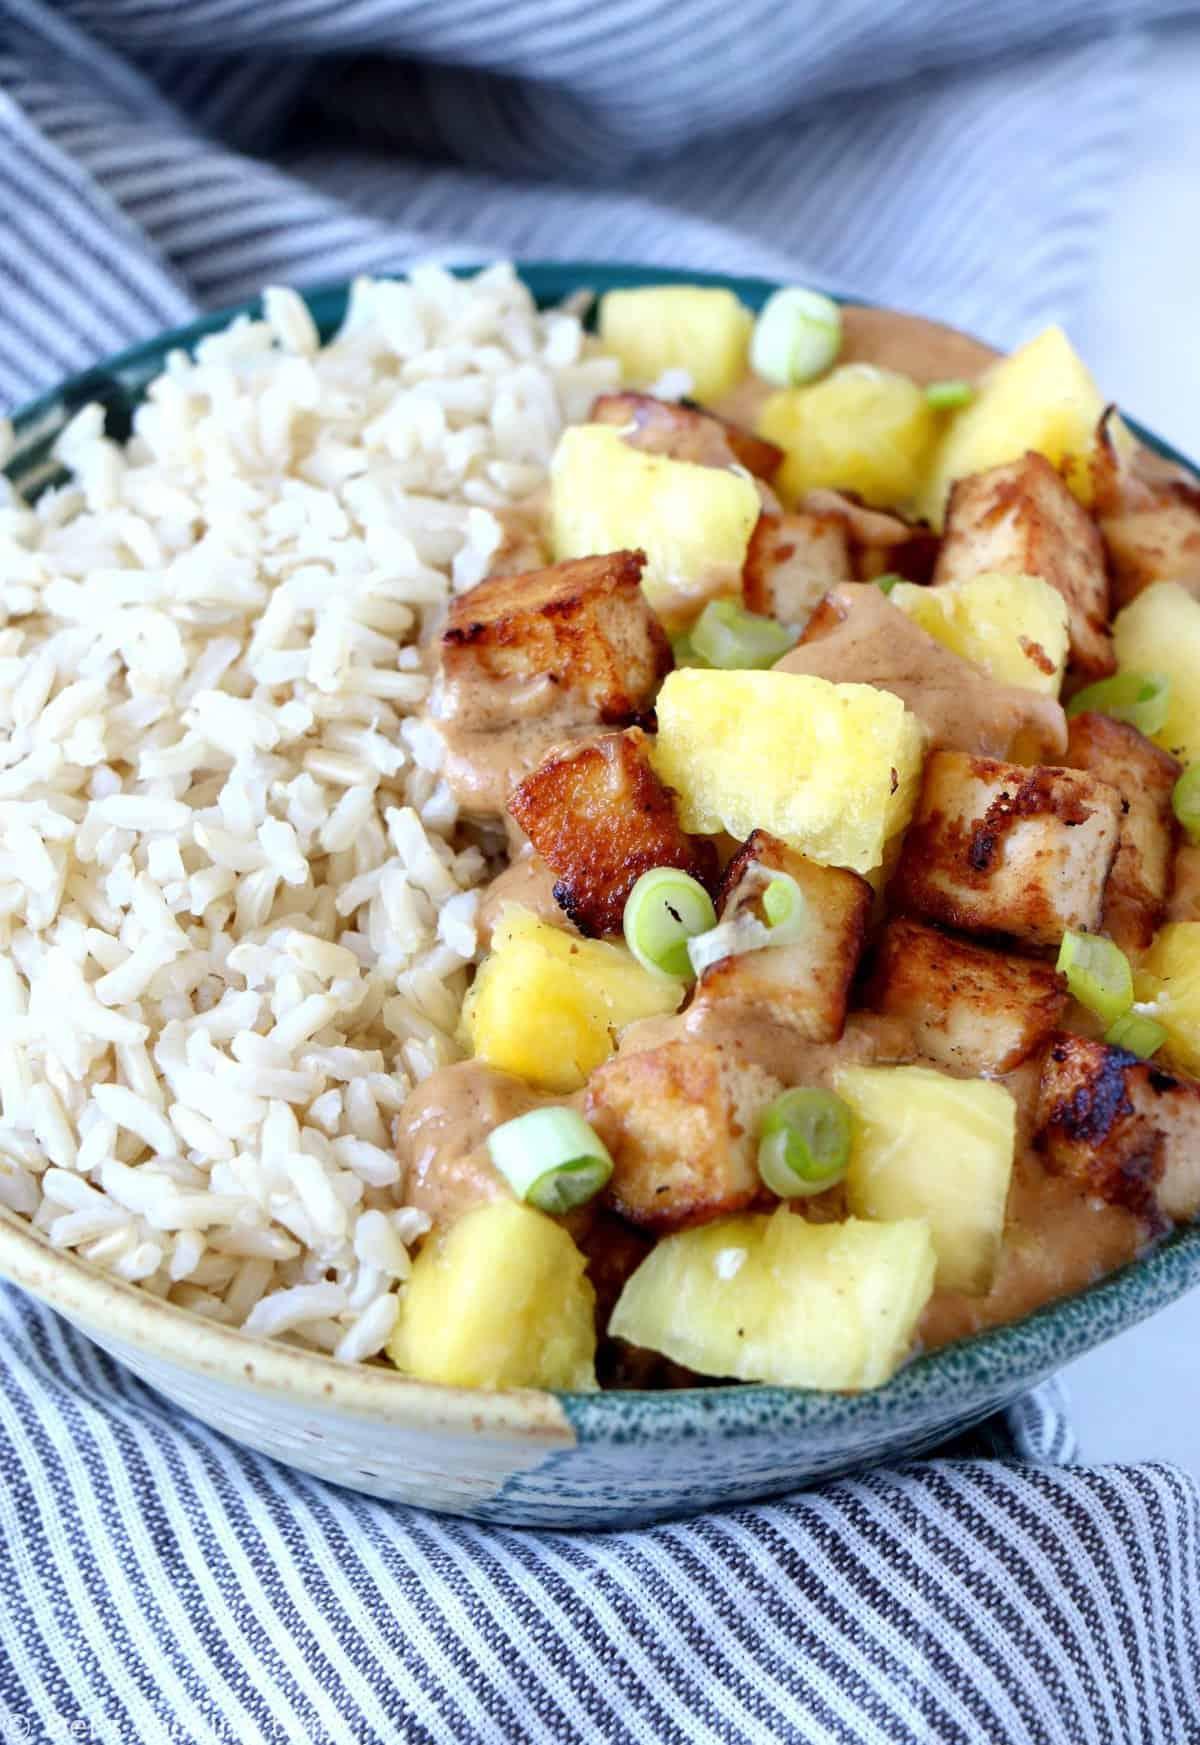 Creamy Peanut Butter Tofu Pineapple Rice